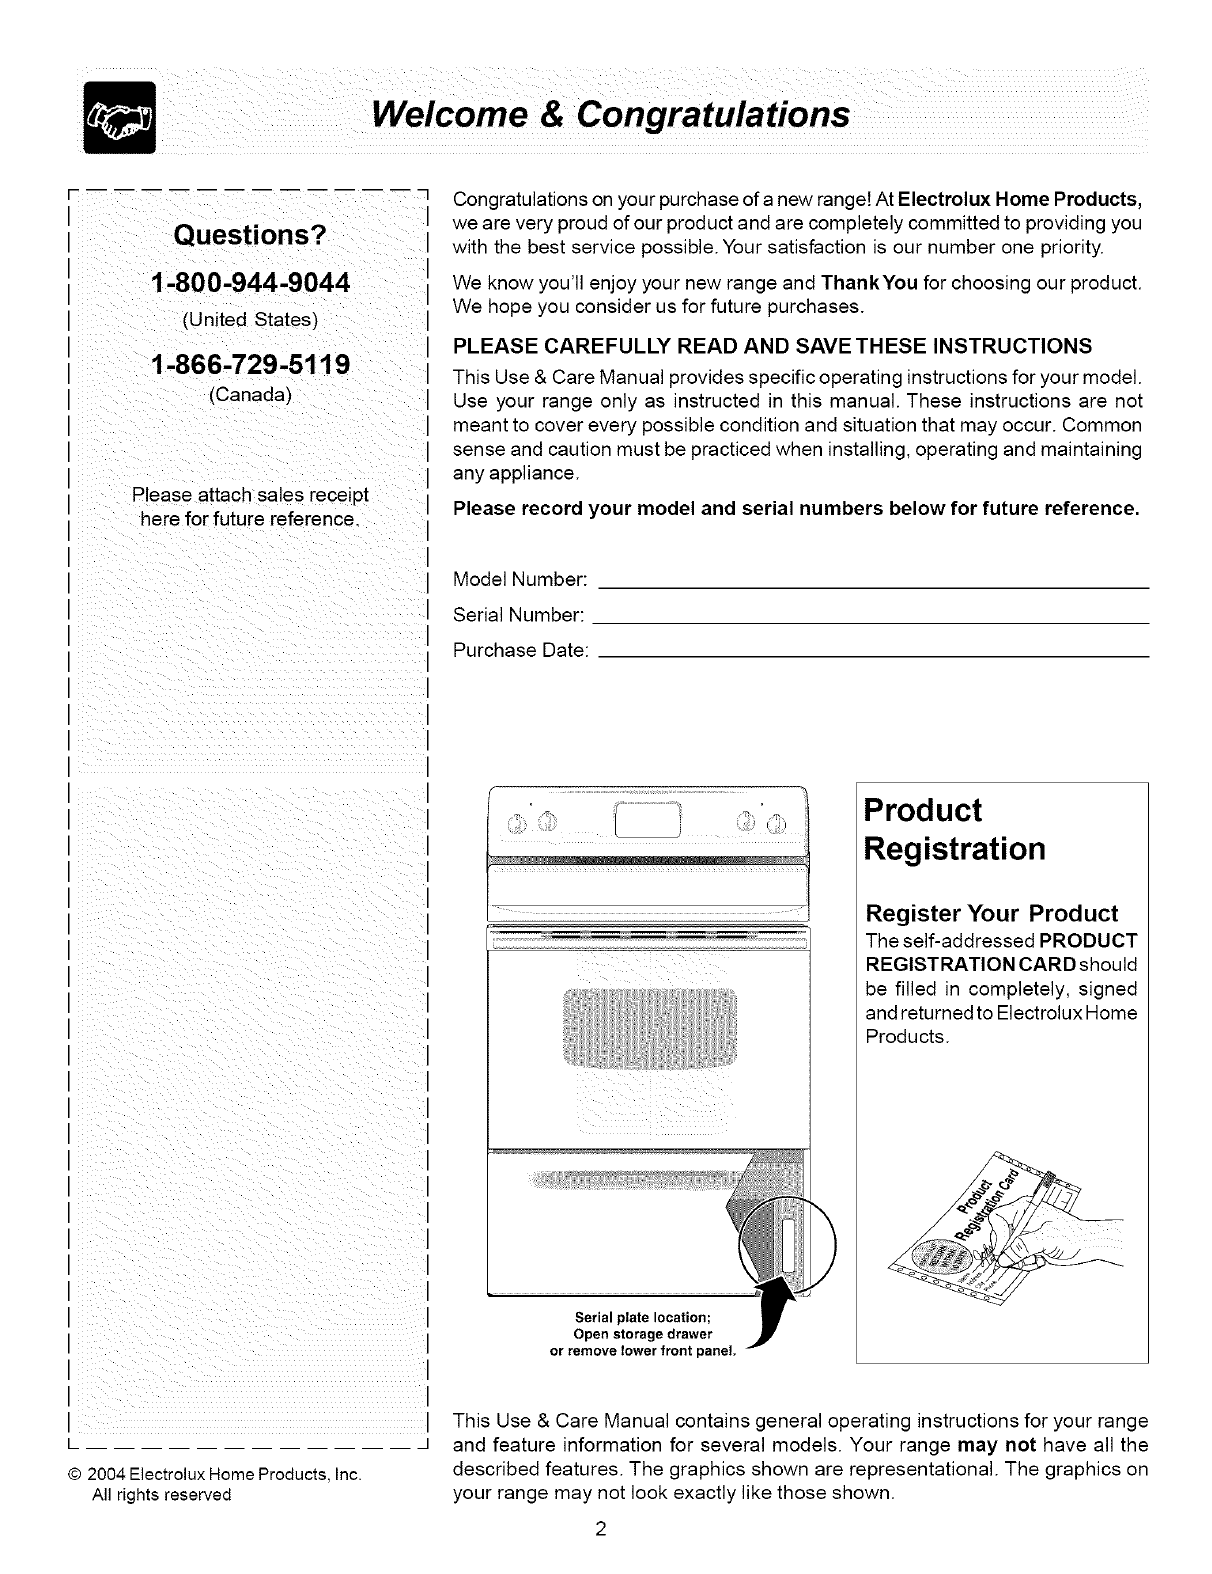 Frigidaire FEF326AUJ User Manual ELECTRIC RANGE Manuals And